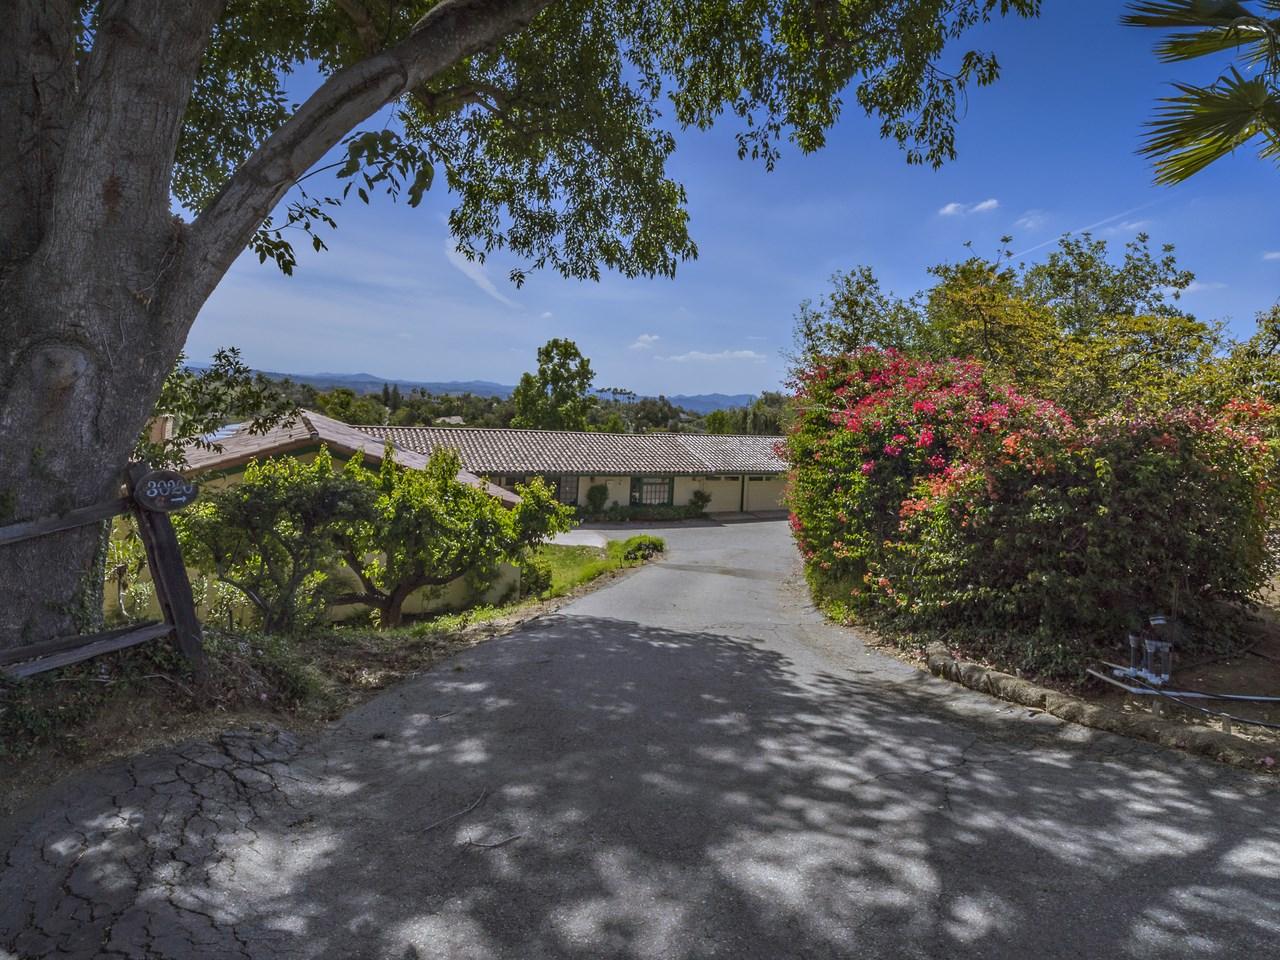 3020 Alta Vista Drive, Fallbrook, CA, 92028 Primary Photo